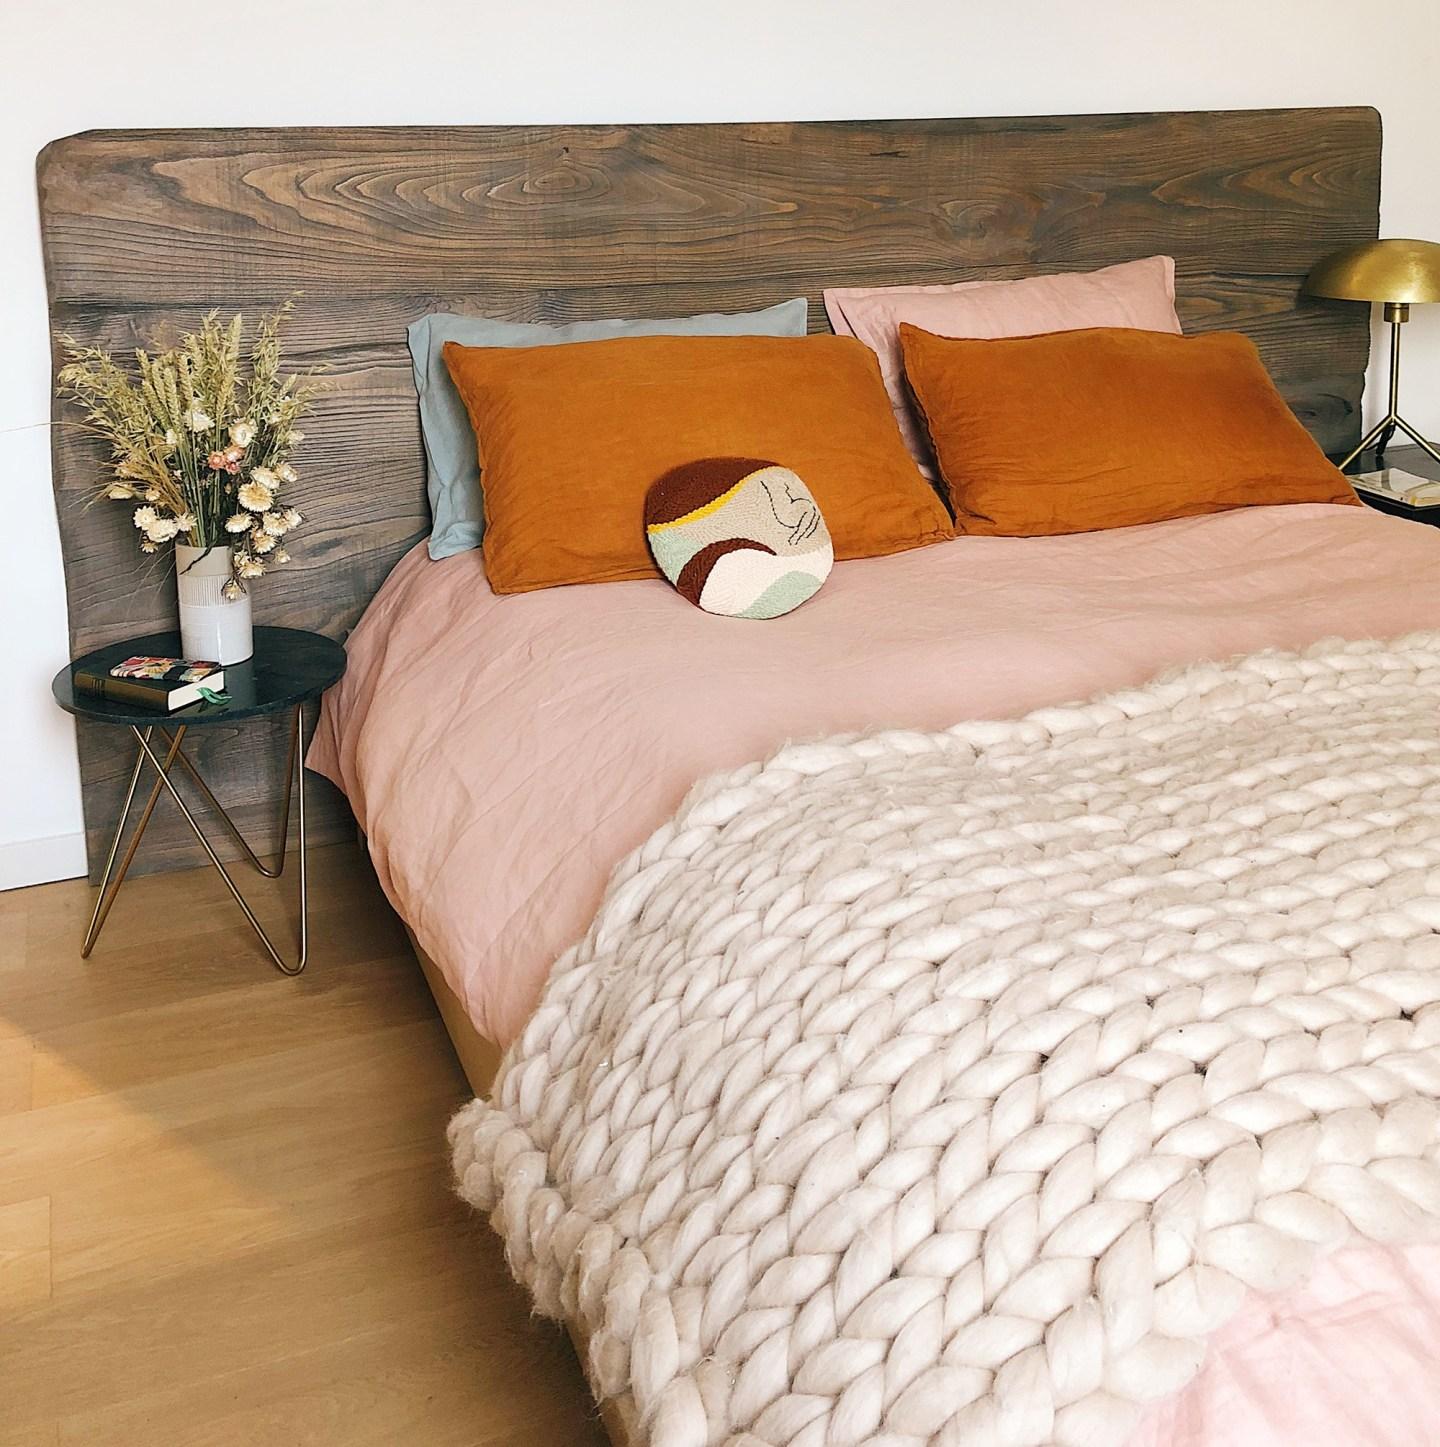 1cbf7fdc9eb Goedkope trucjes om je slaapkamer er luxe uit te laten zien ⋆ Budg ...